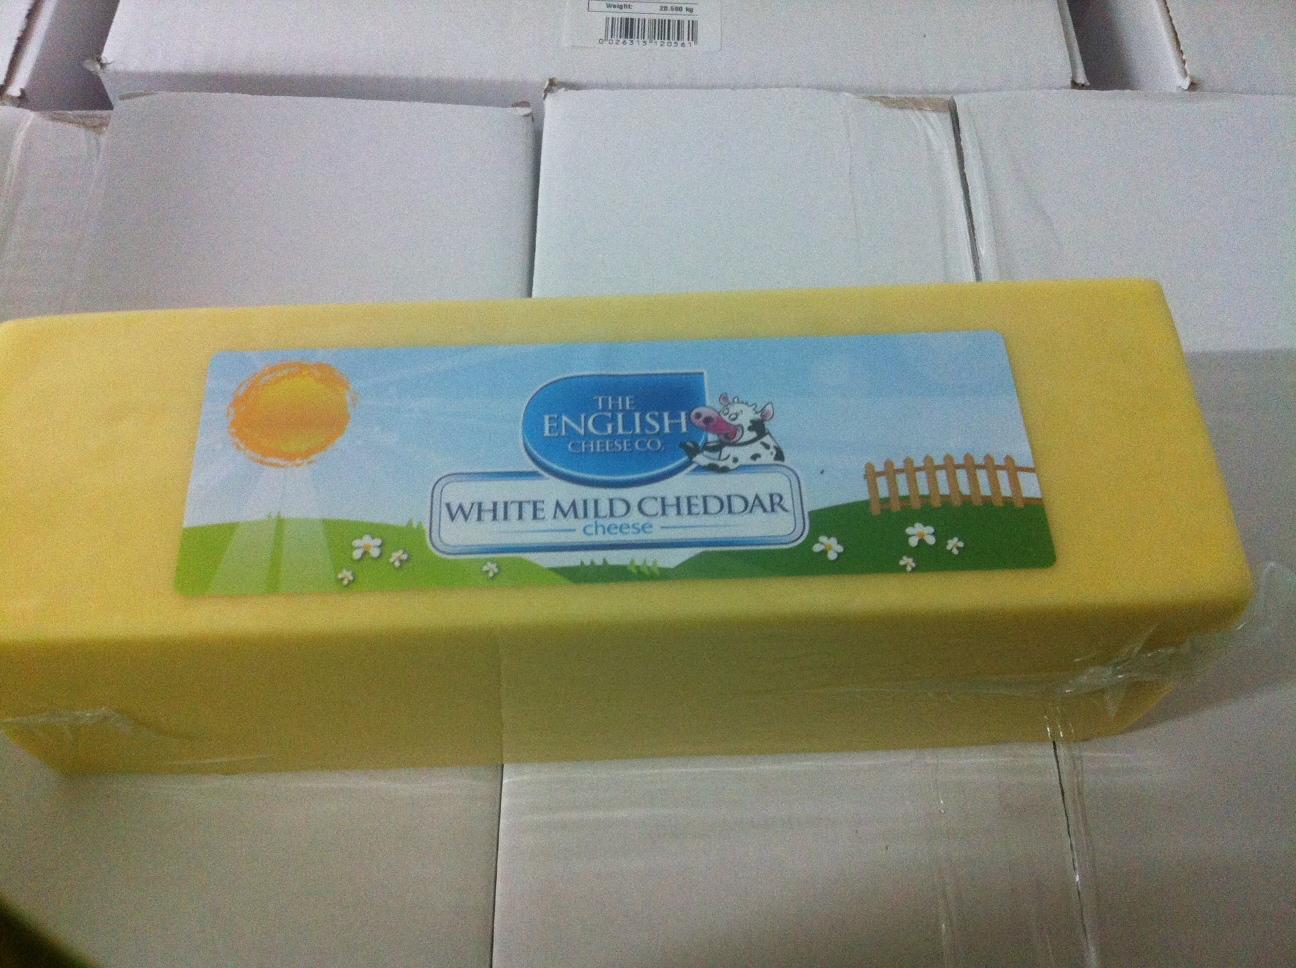 White Mild Cheddar Cheese